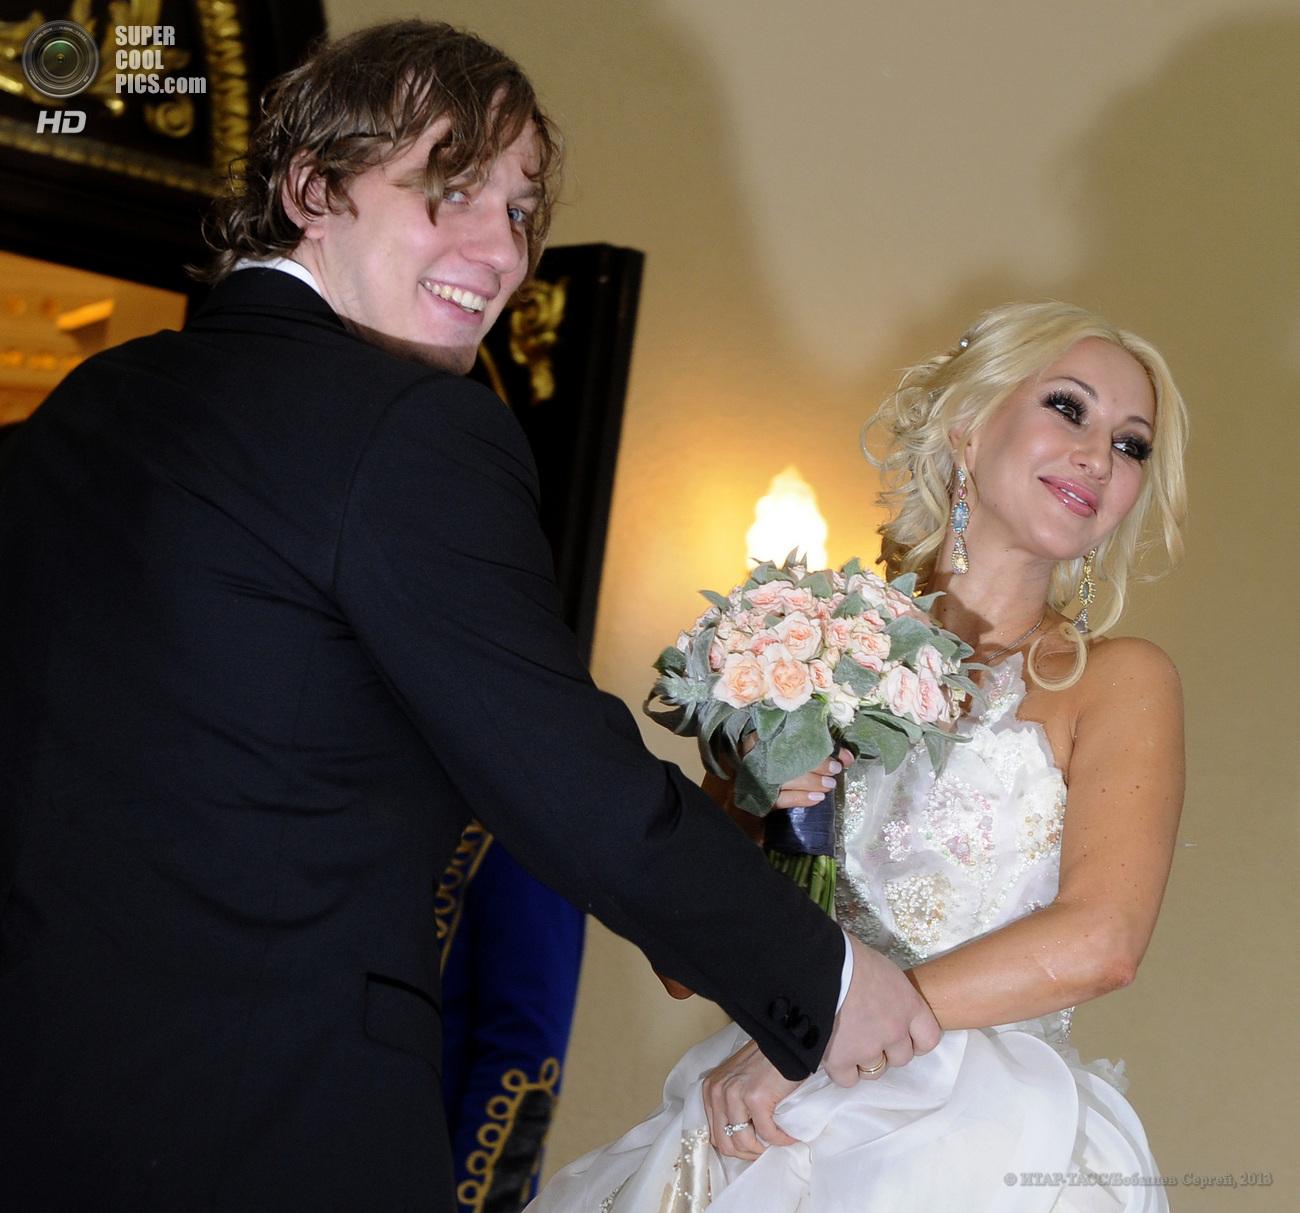 Вышла замуж лера кудрявцева фото